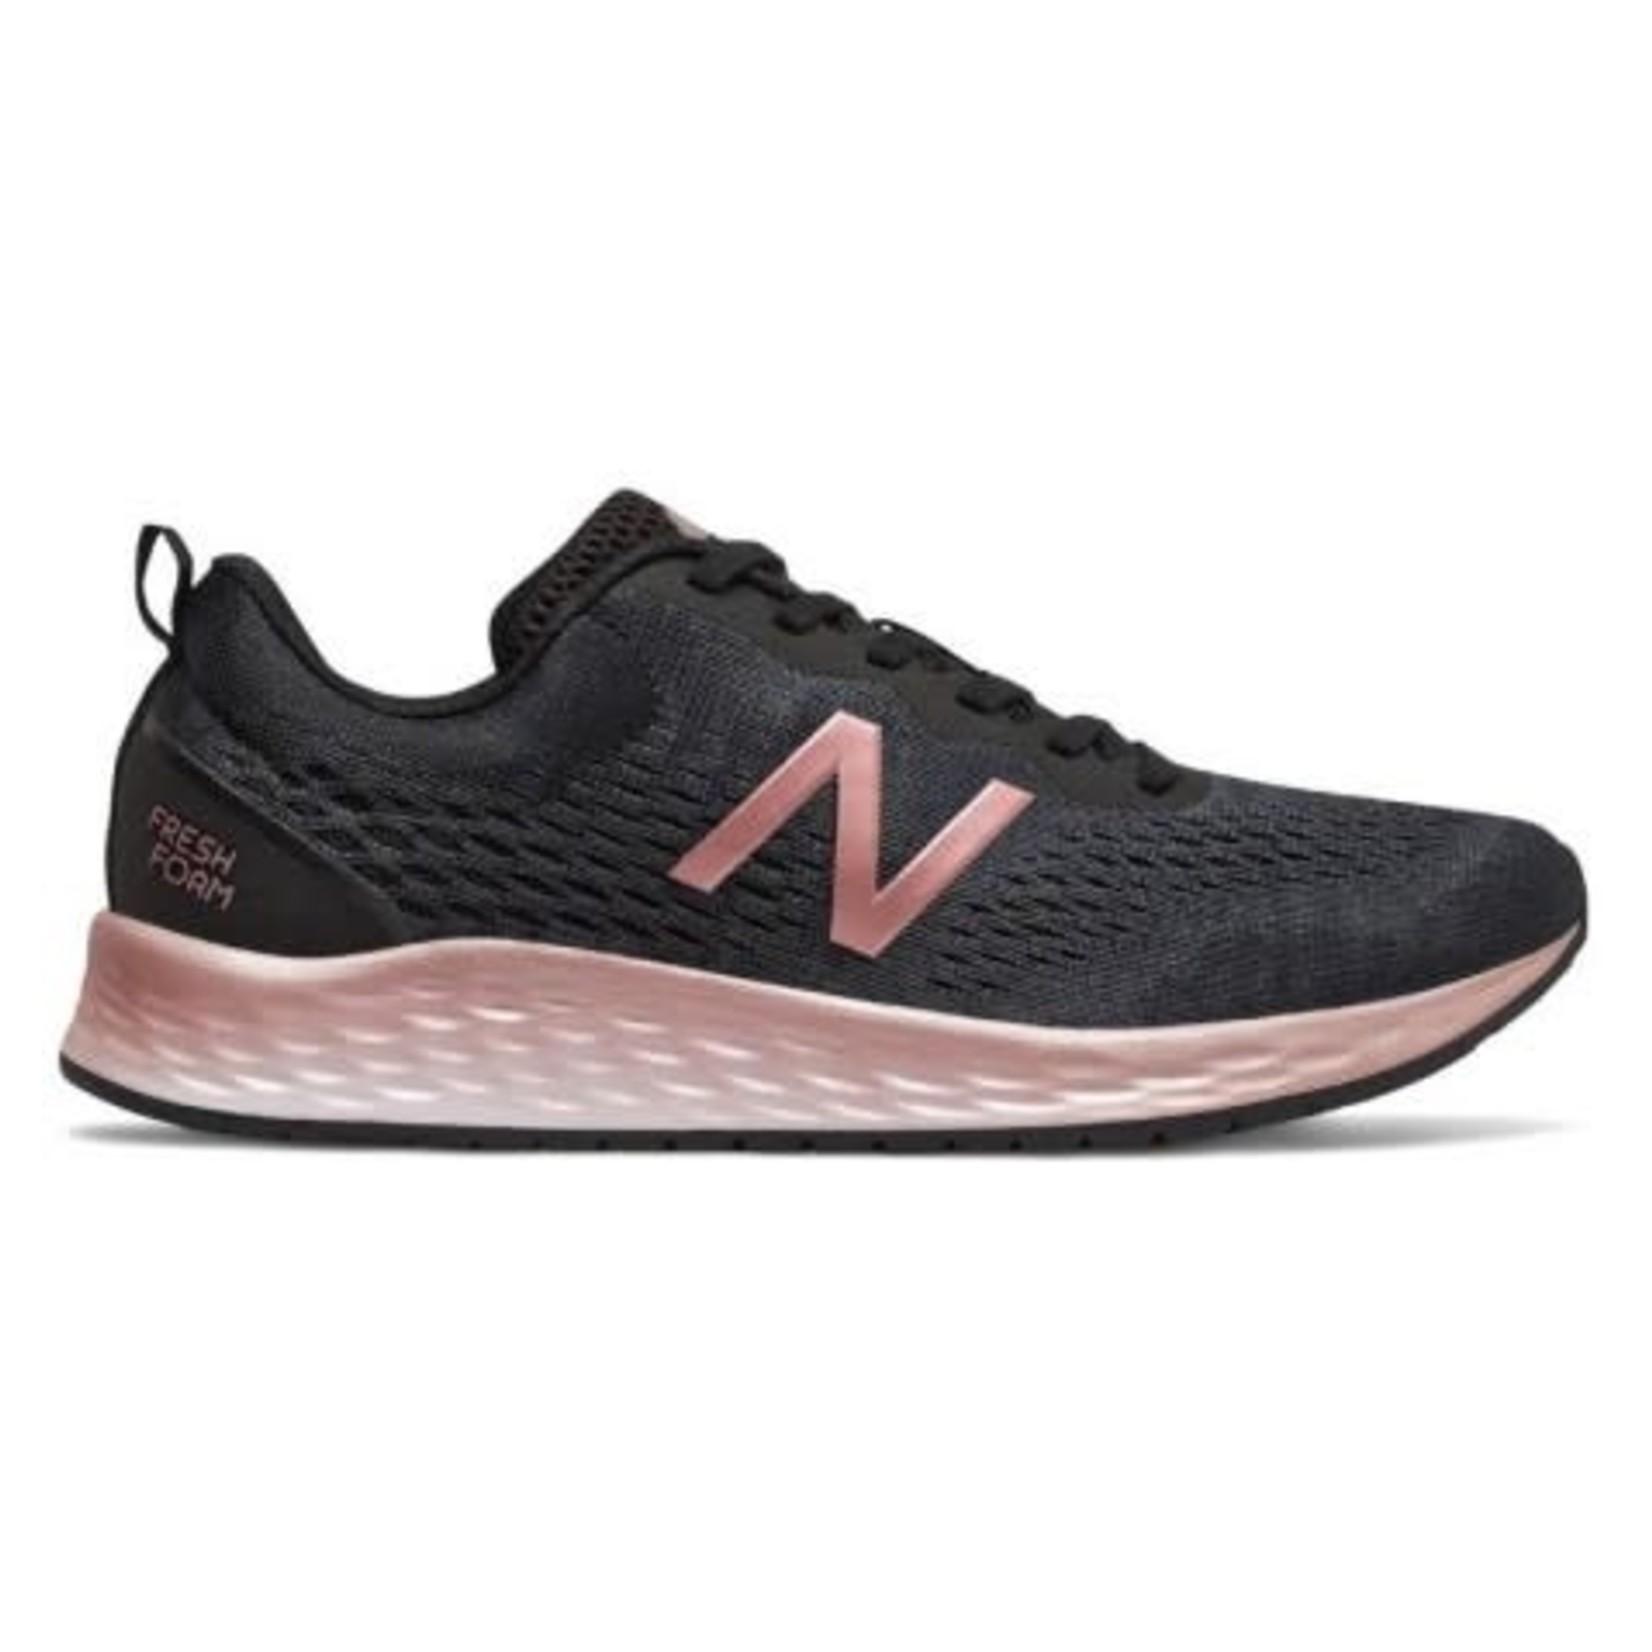 New Balance New Balance Running Shoes, Arishi v3, Ladies